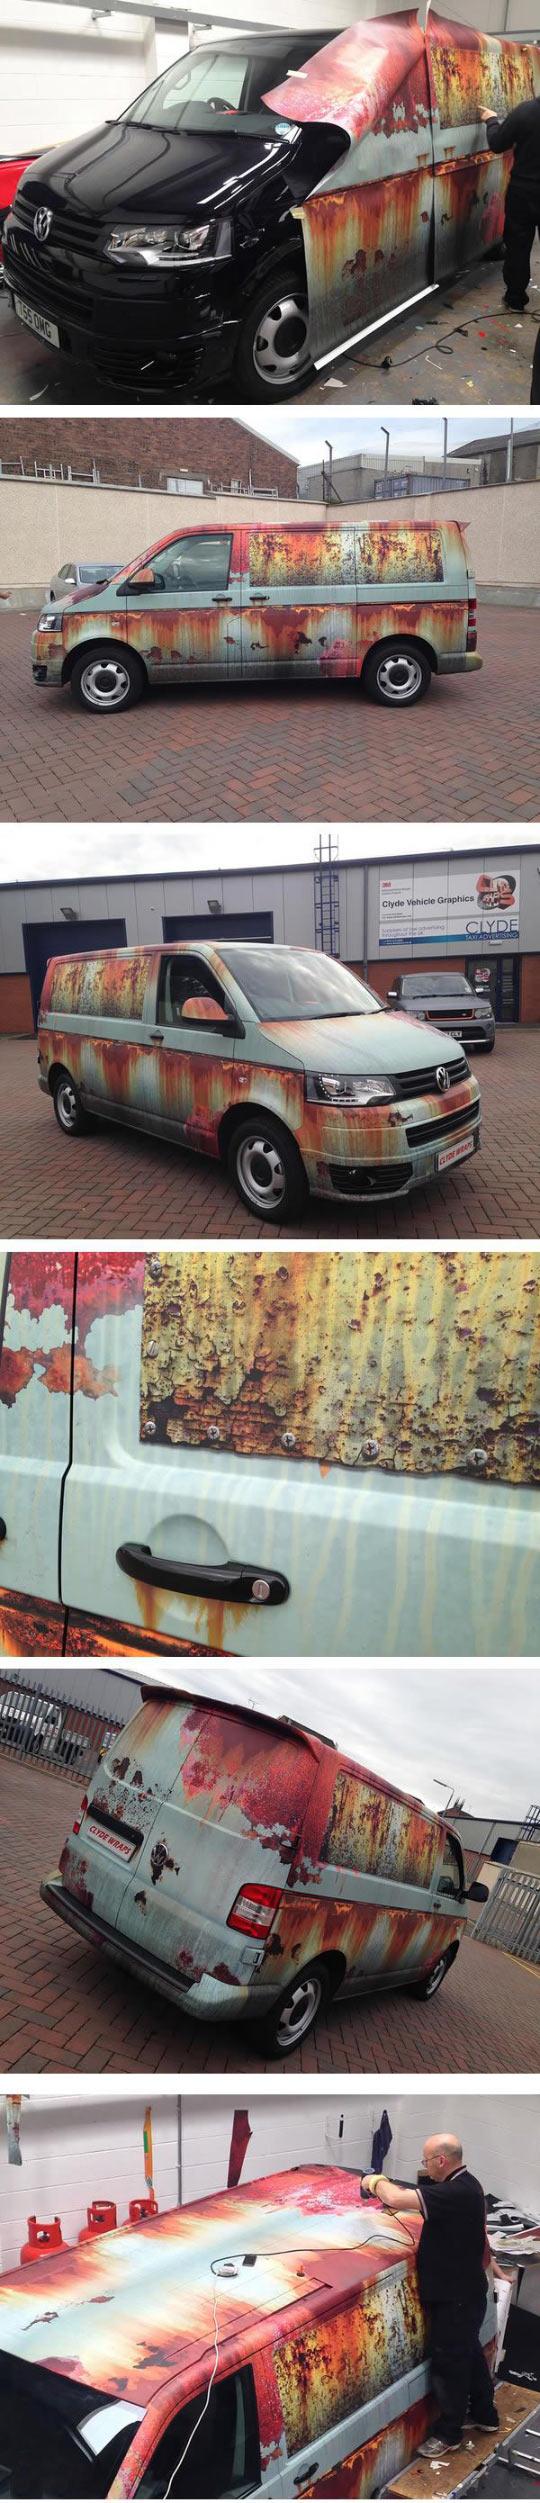 funny-van-rusty-painting